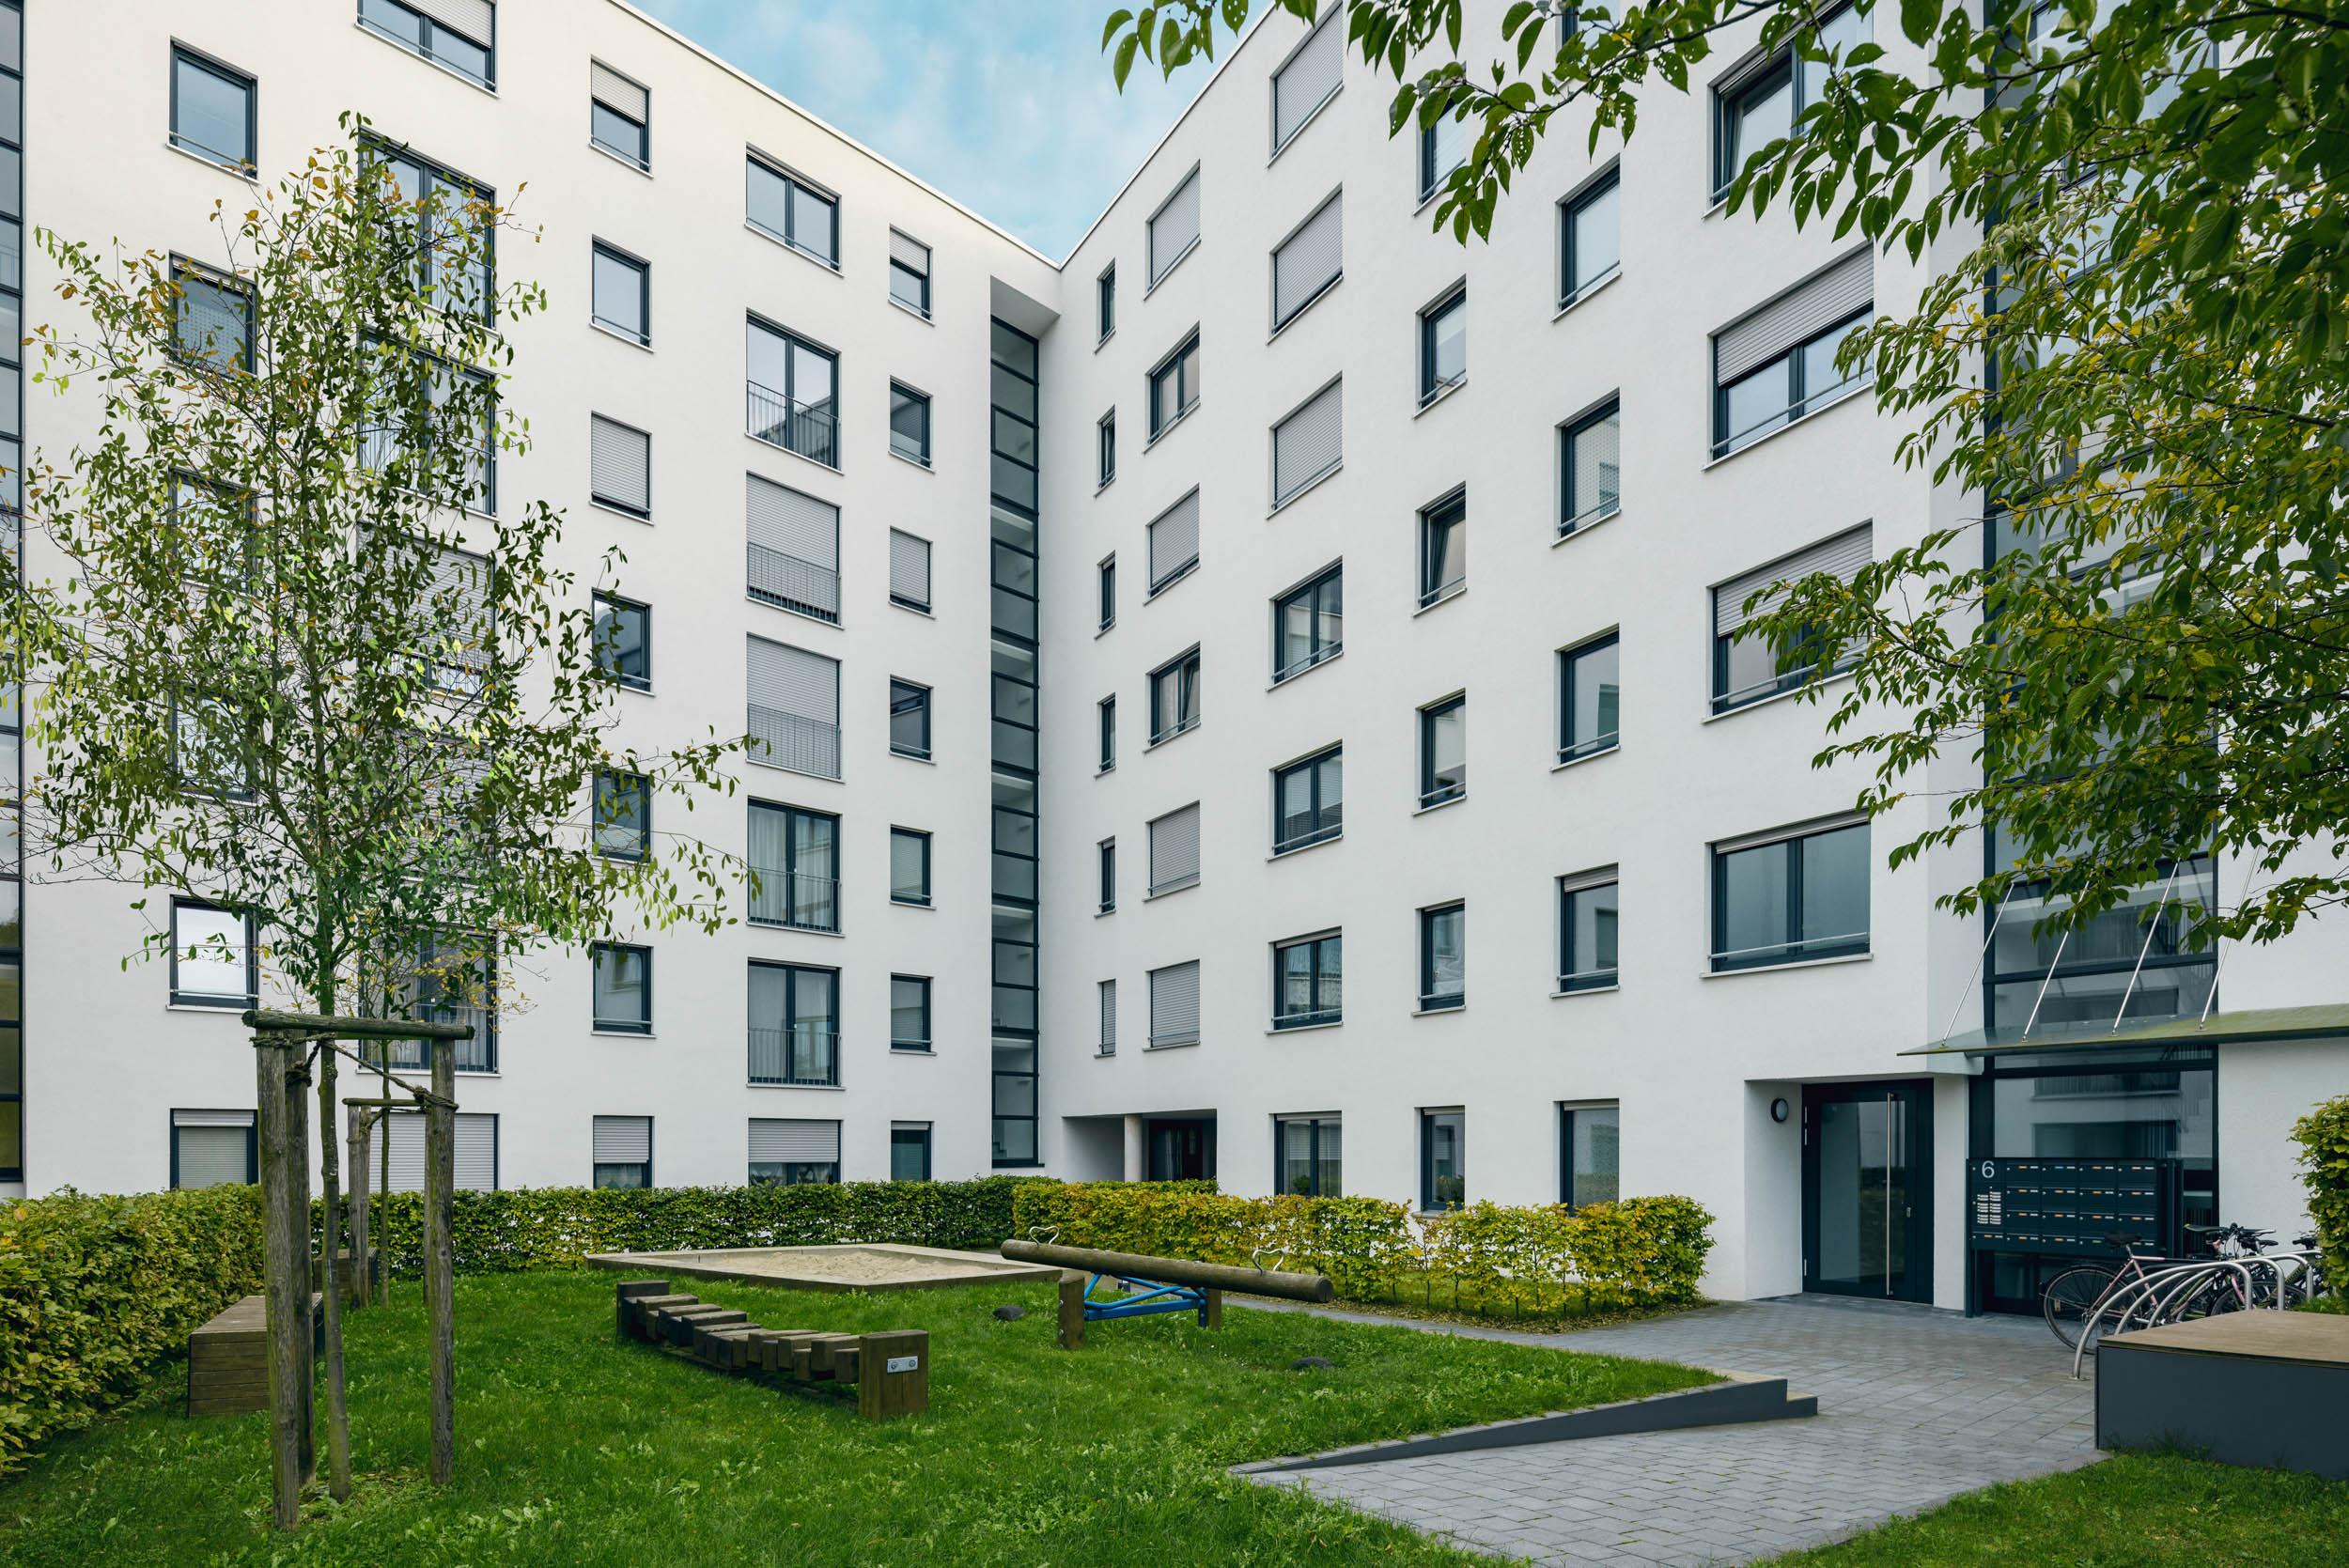 Gustav-Epple-Bauunternehmung-Meluner-Straße-MLX8118